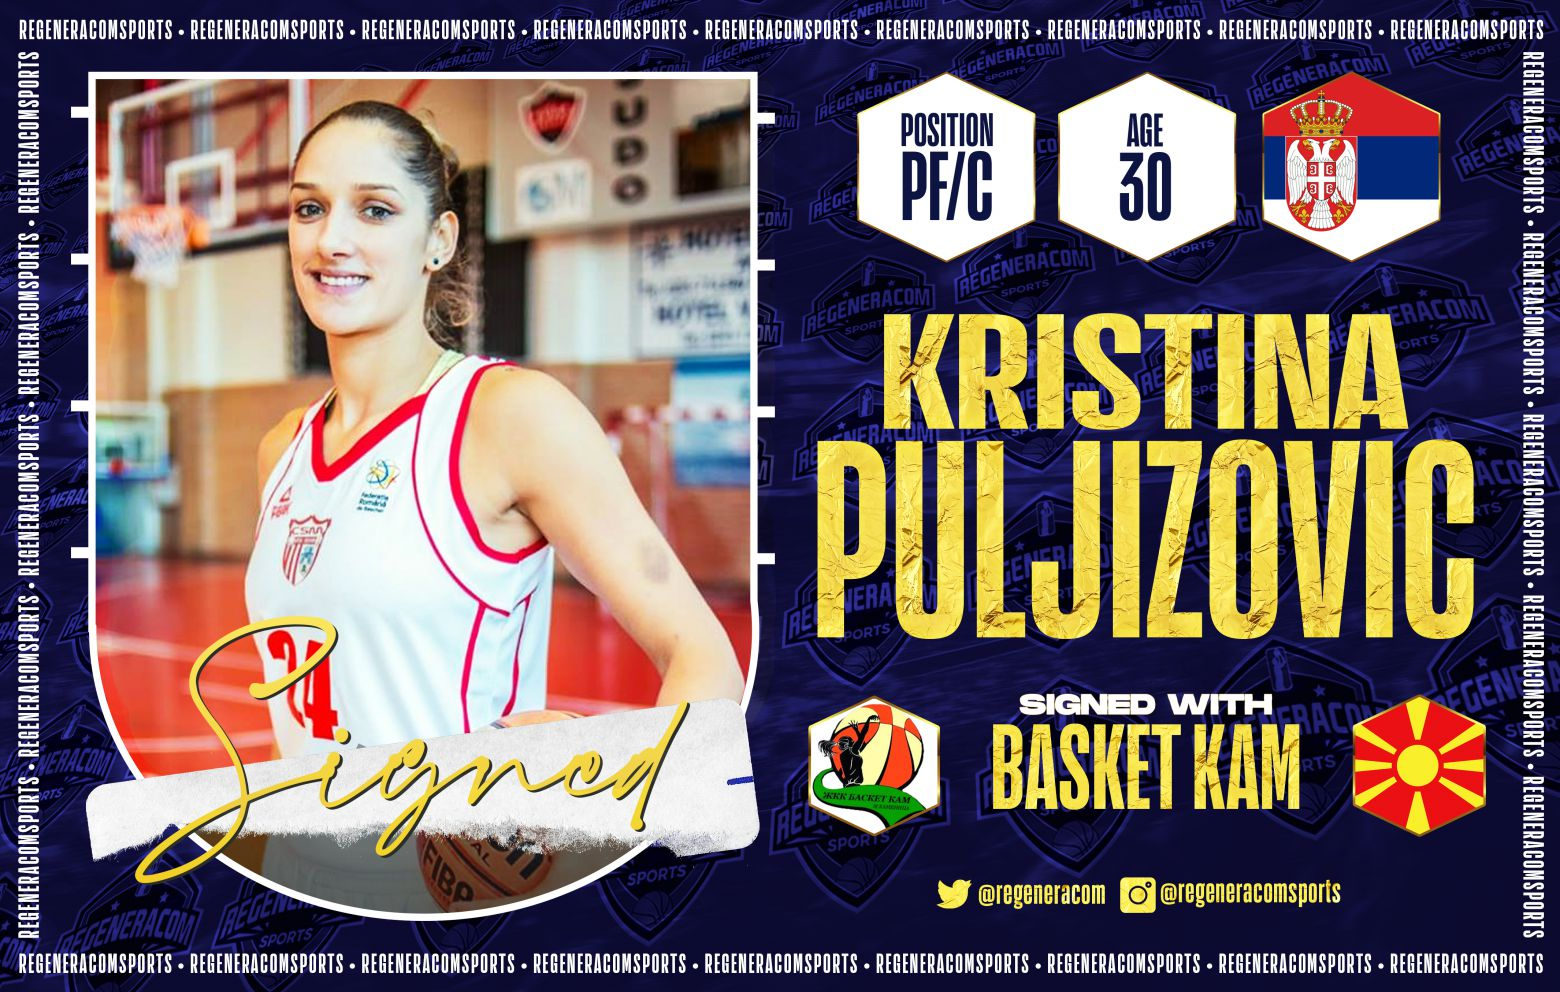 KRISTINA PULJIZOVIC ha firmado con Basket KAM para la temporada 2021/22